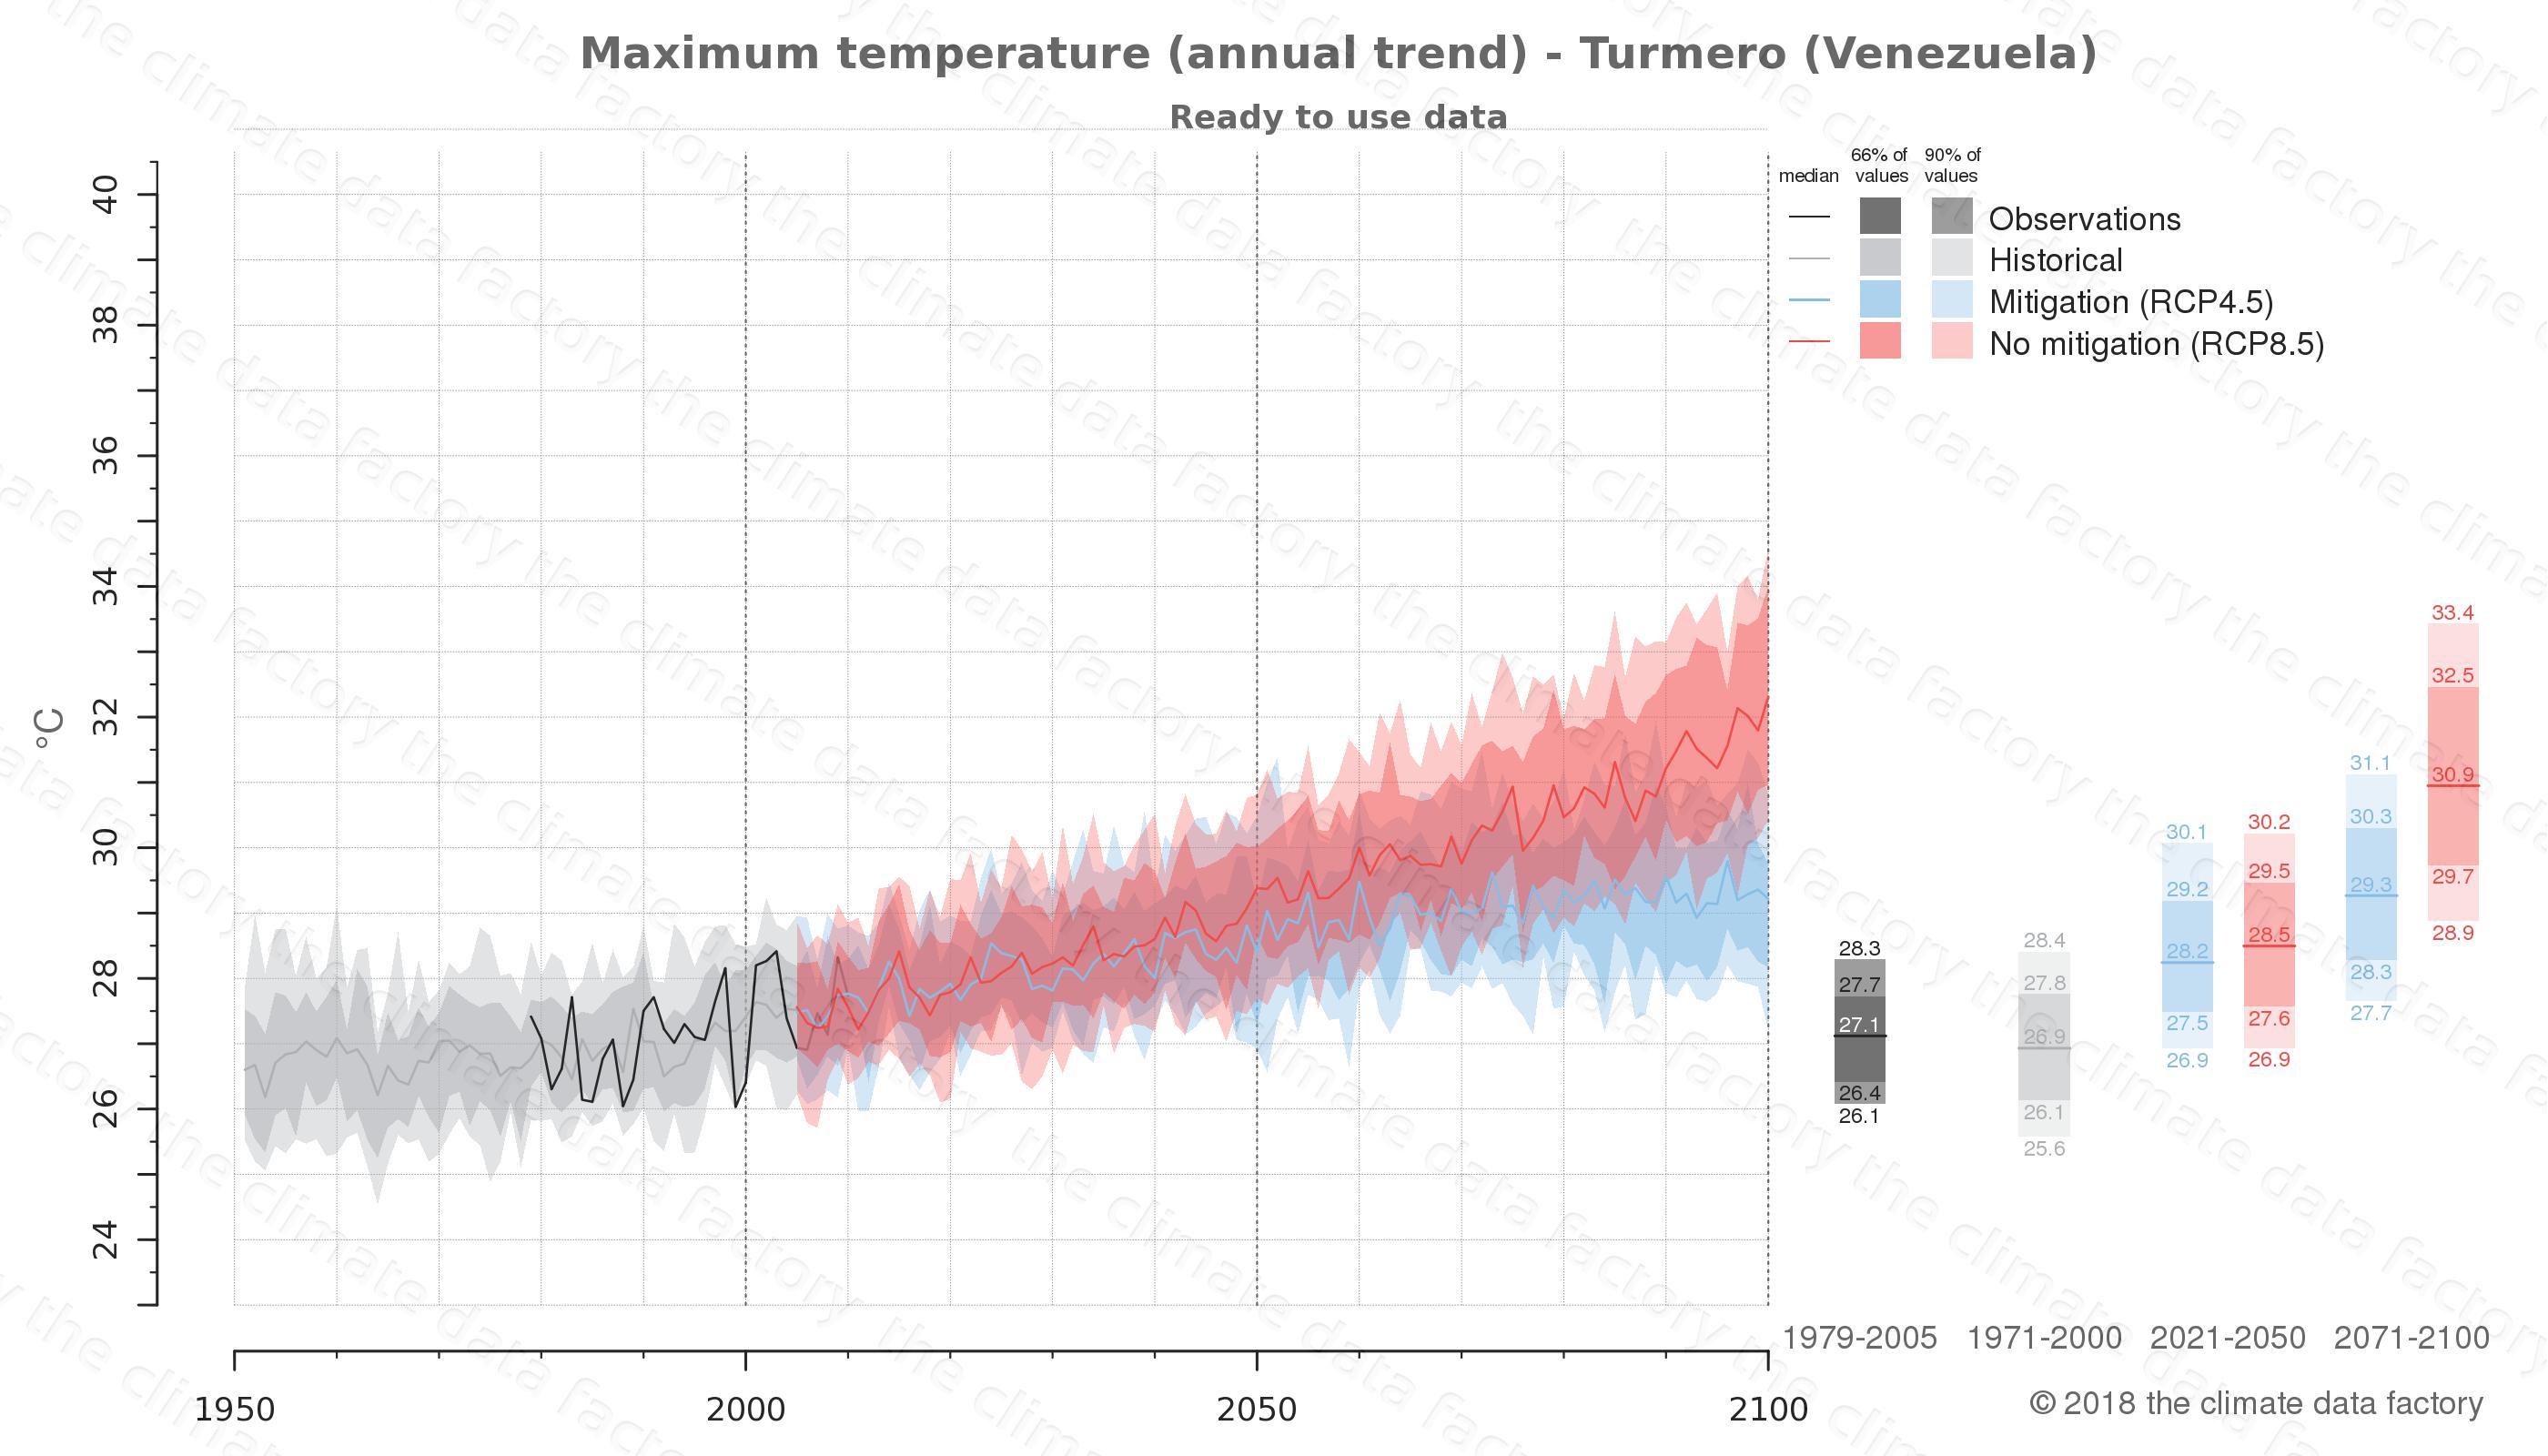 climate change data policy adaptation climate graph city data maximum-temperature turmero venezuela